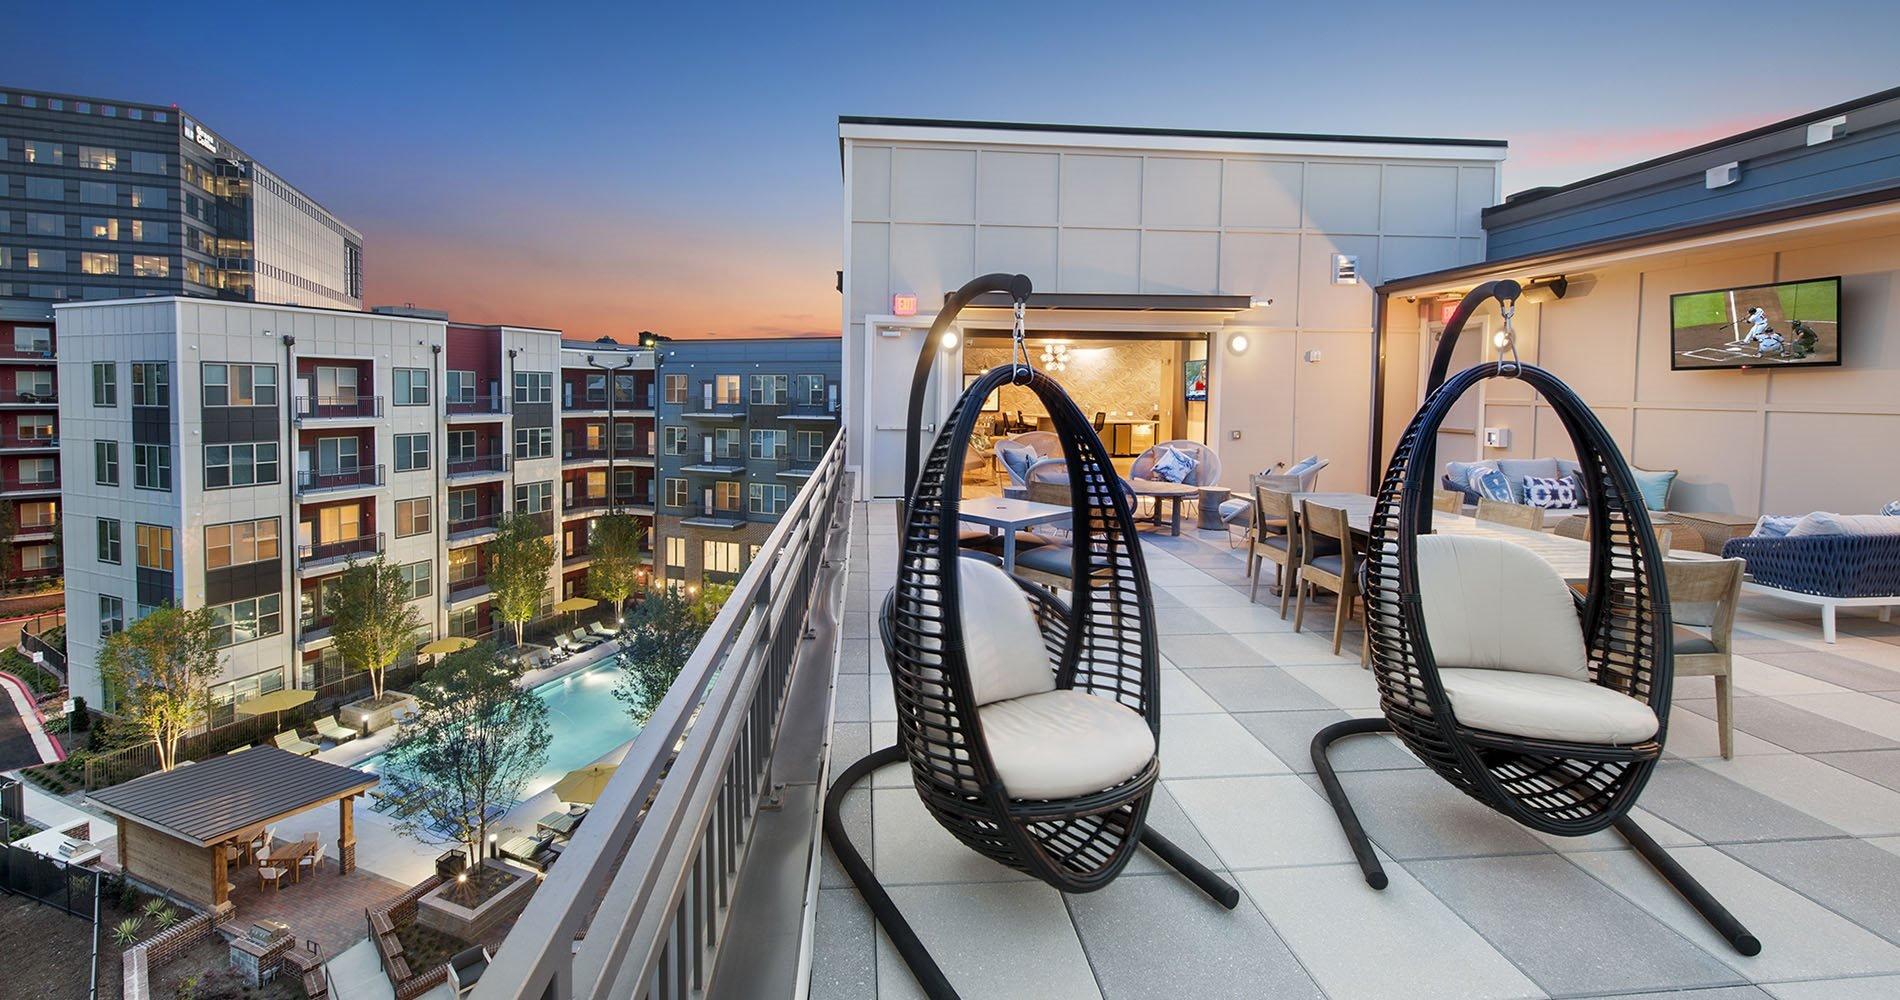 Rooftop Deck at City View Vinings Apartments in Atlanta, GA 30339